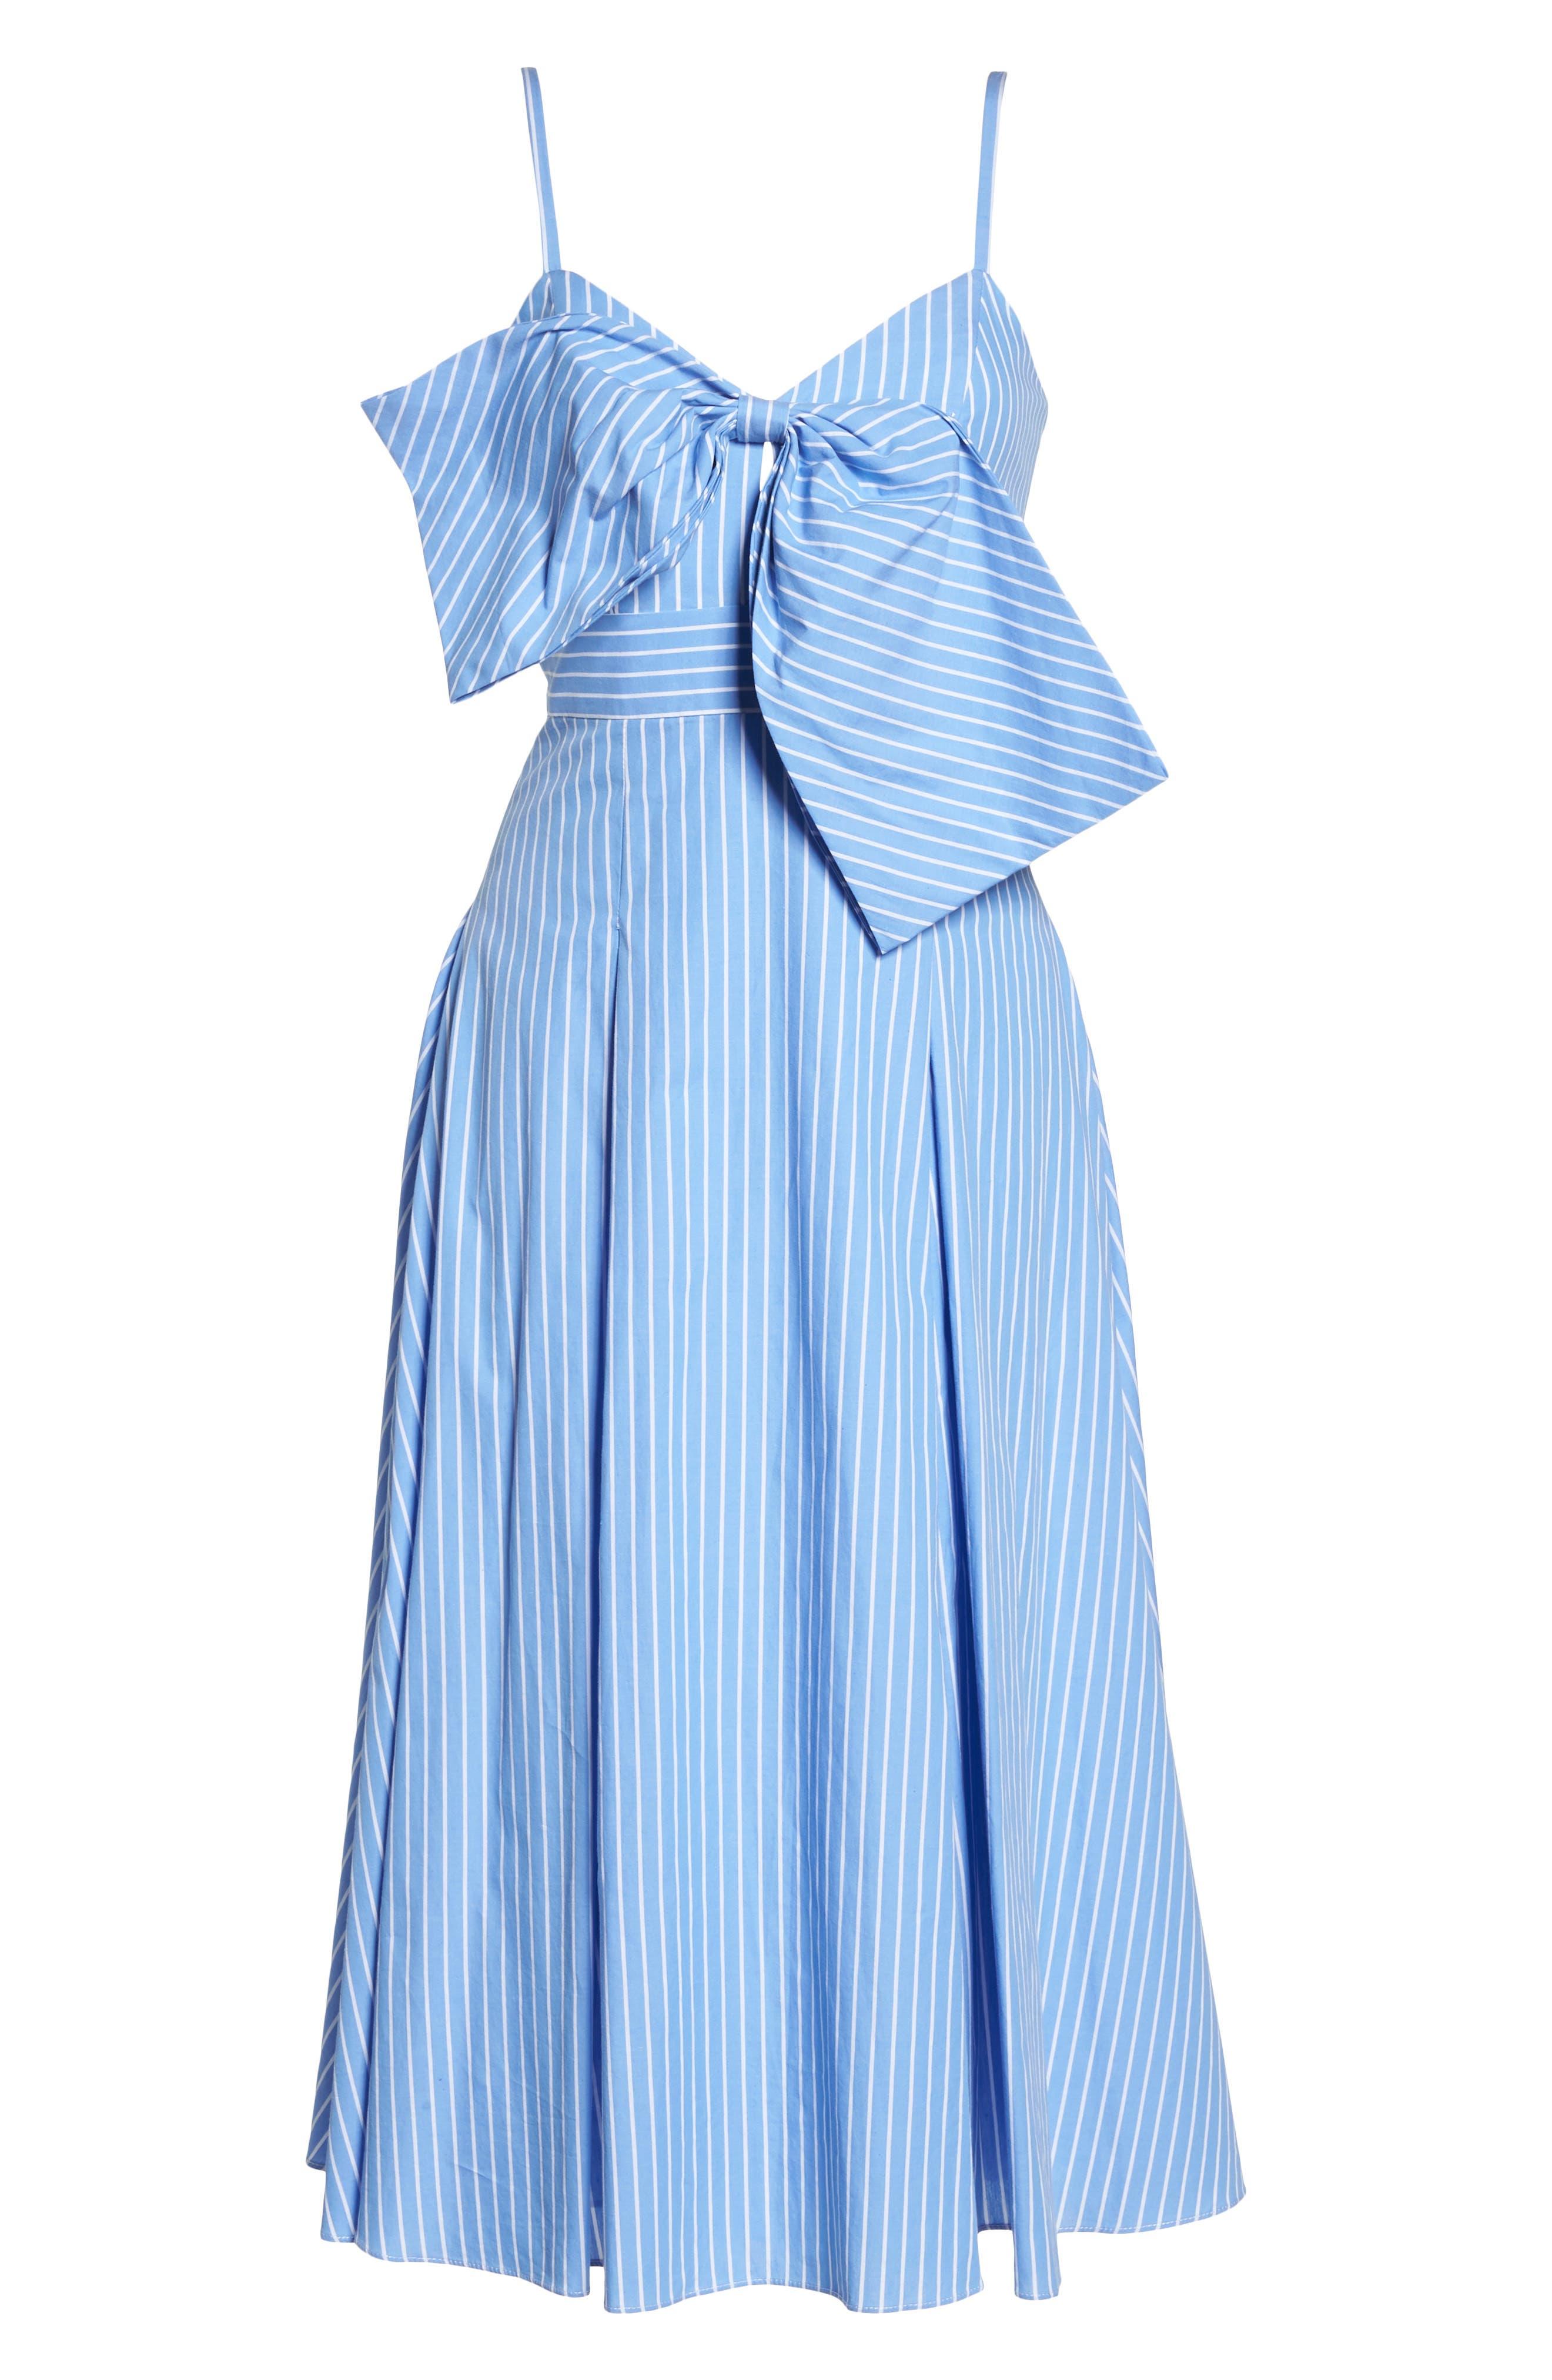 Becky Bow Front Tea Length Dress,                             Alternate thumbnail 7, color,                             Pale Blue/ White Stripe